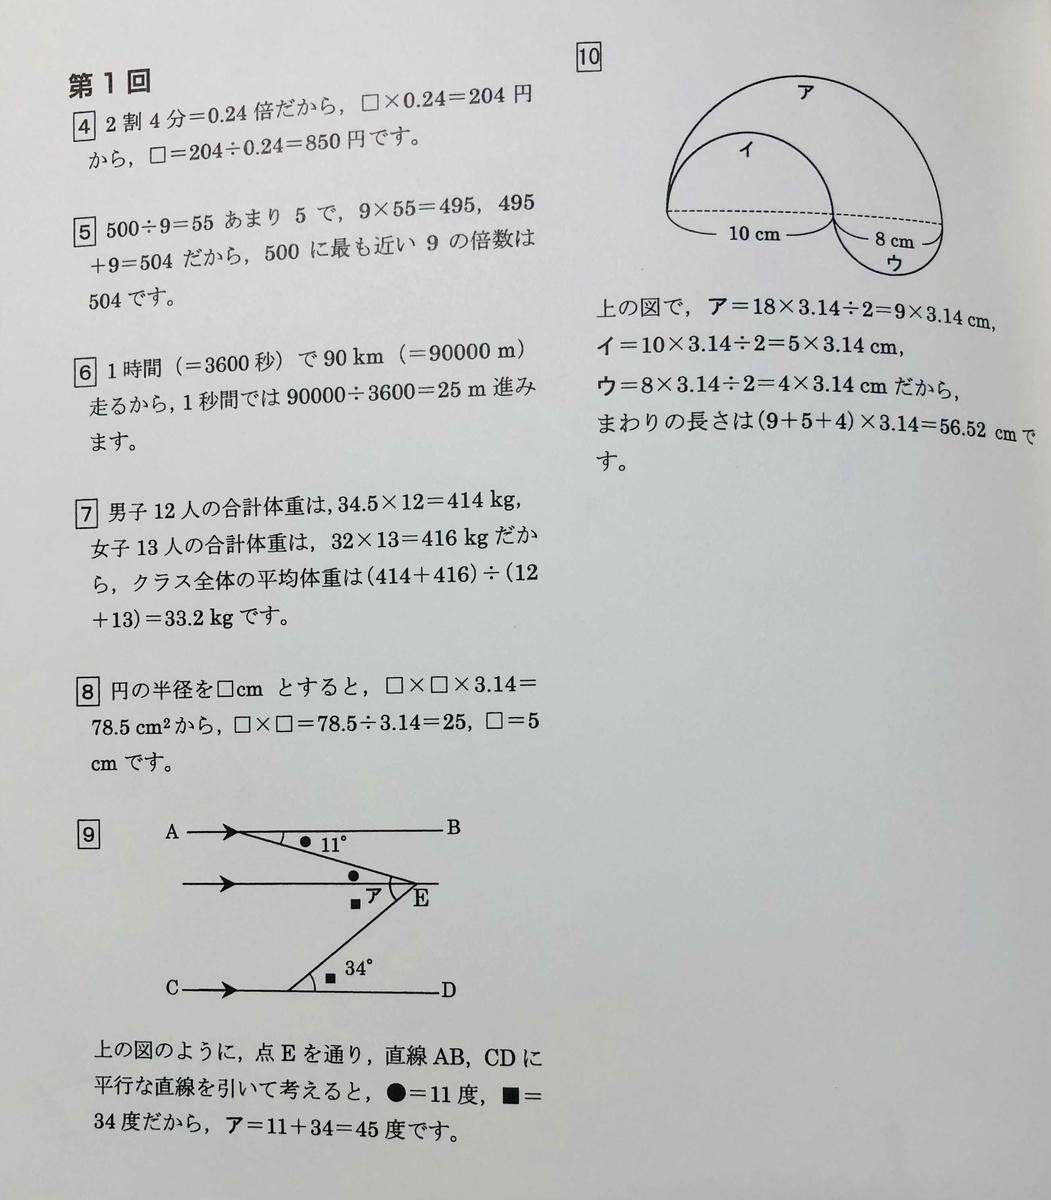 f:id:sakurako-tulipko:20210506105031j:plain